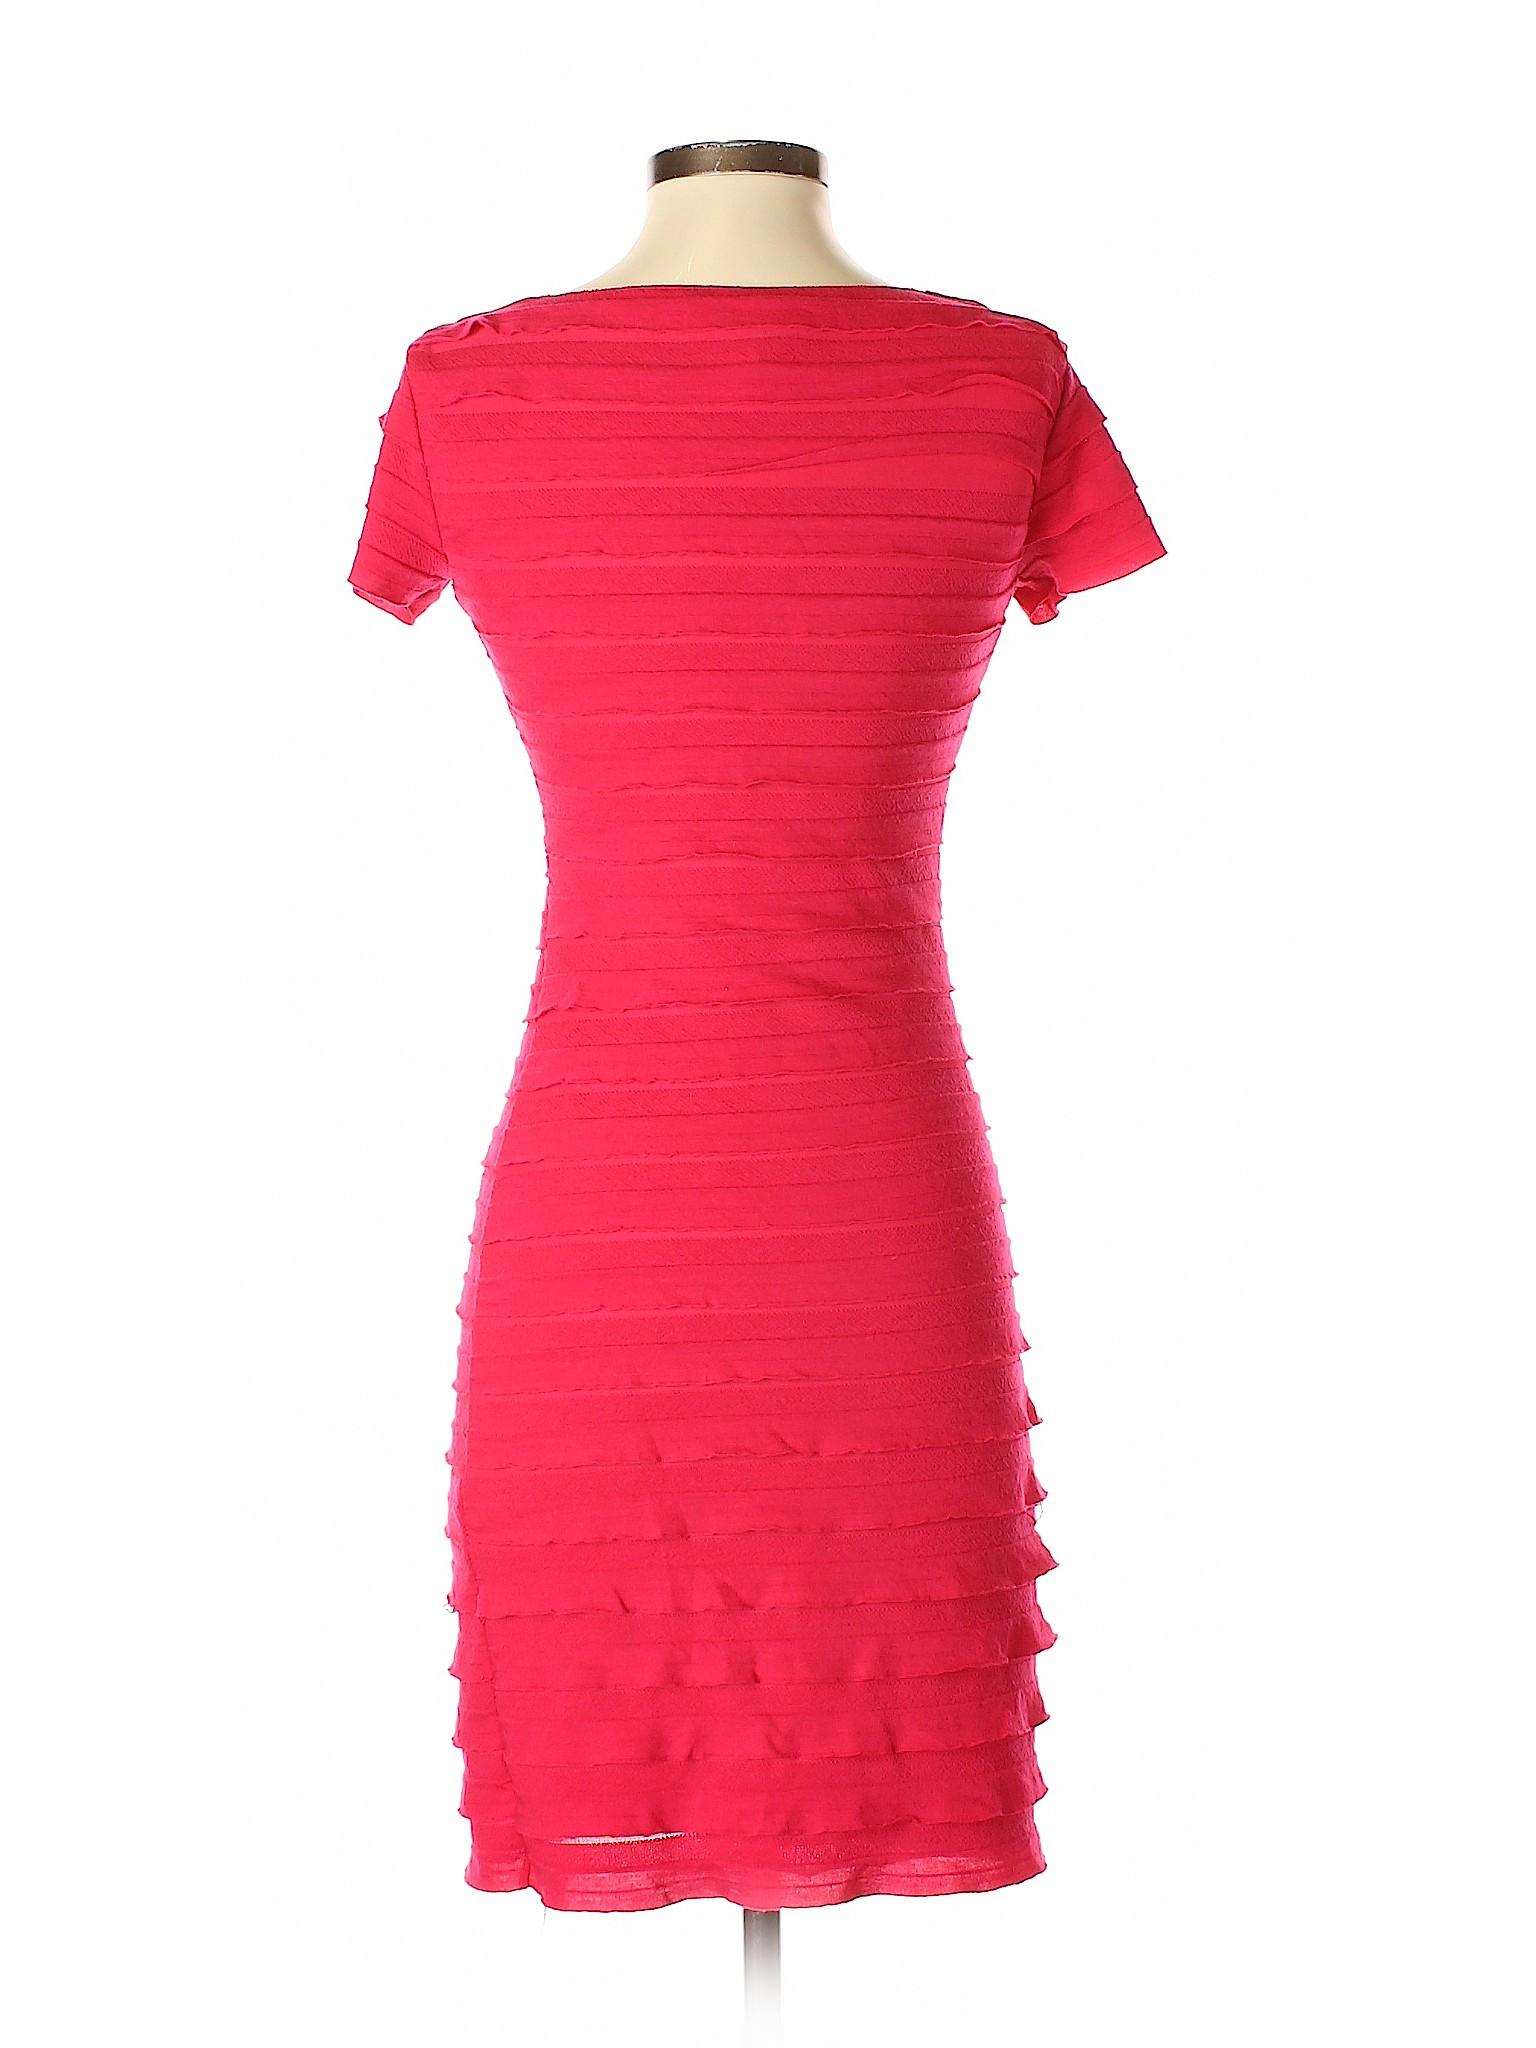 Dress Max Max Selling Selling Studio Casual Casual Studio Dress pB7wqxvB